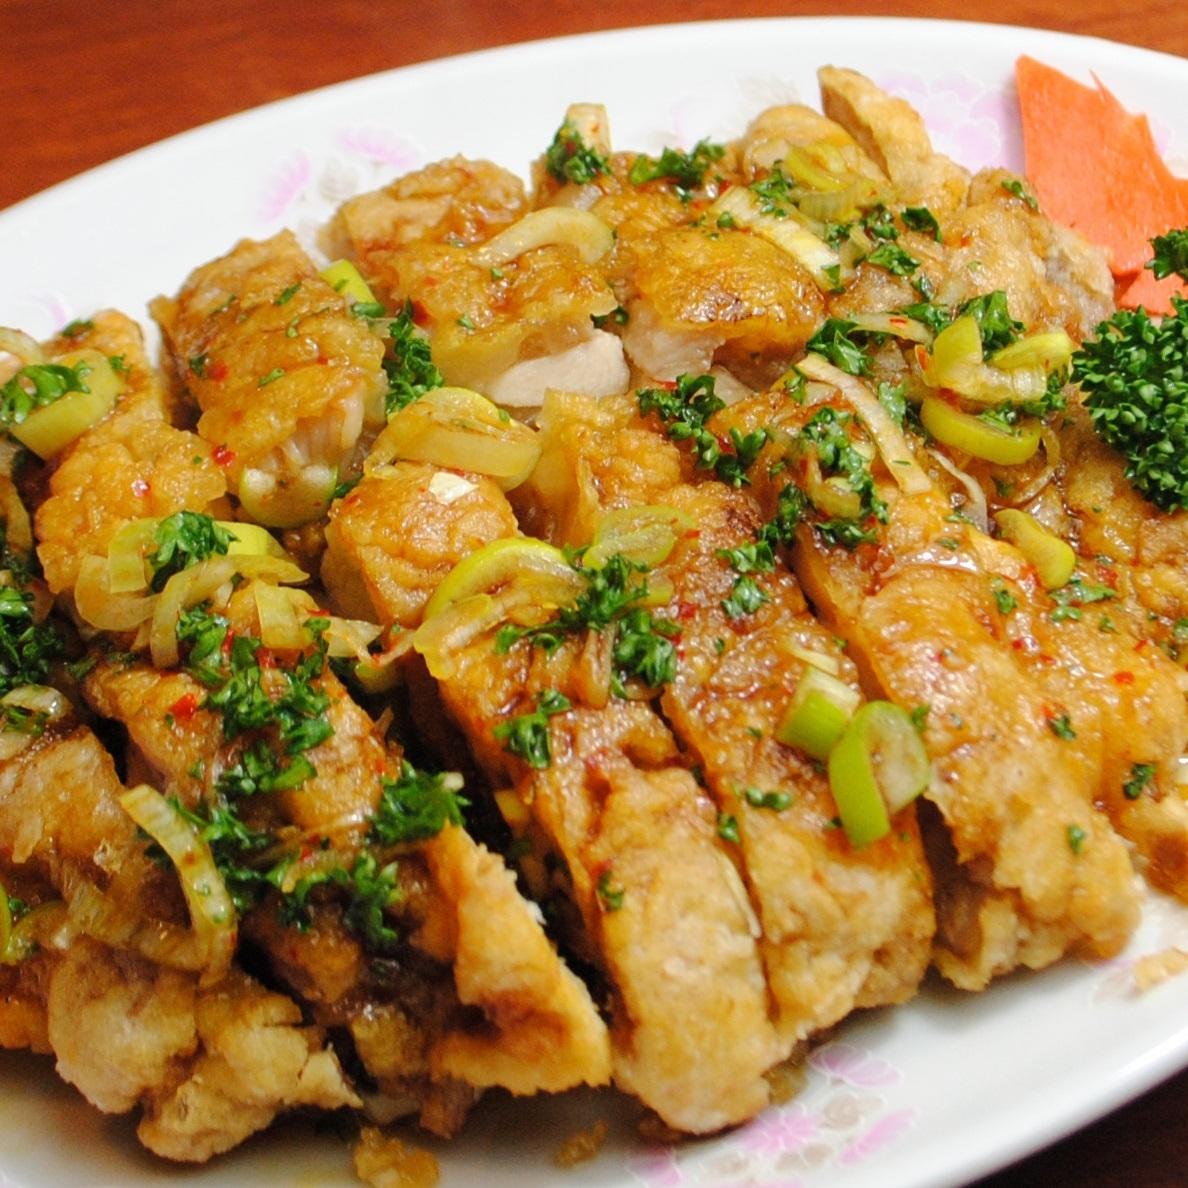 Eulinji(油gonocides)/炒雞炸雞